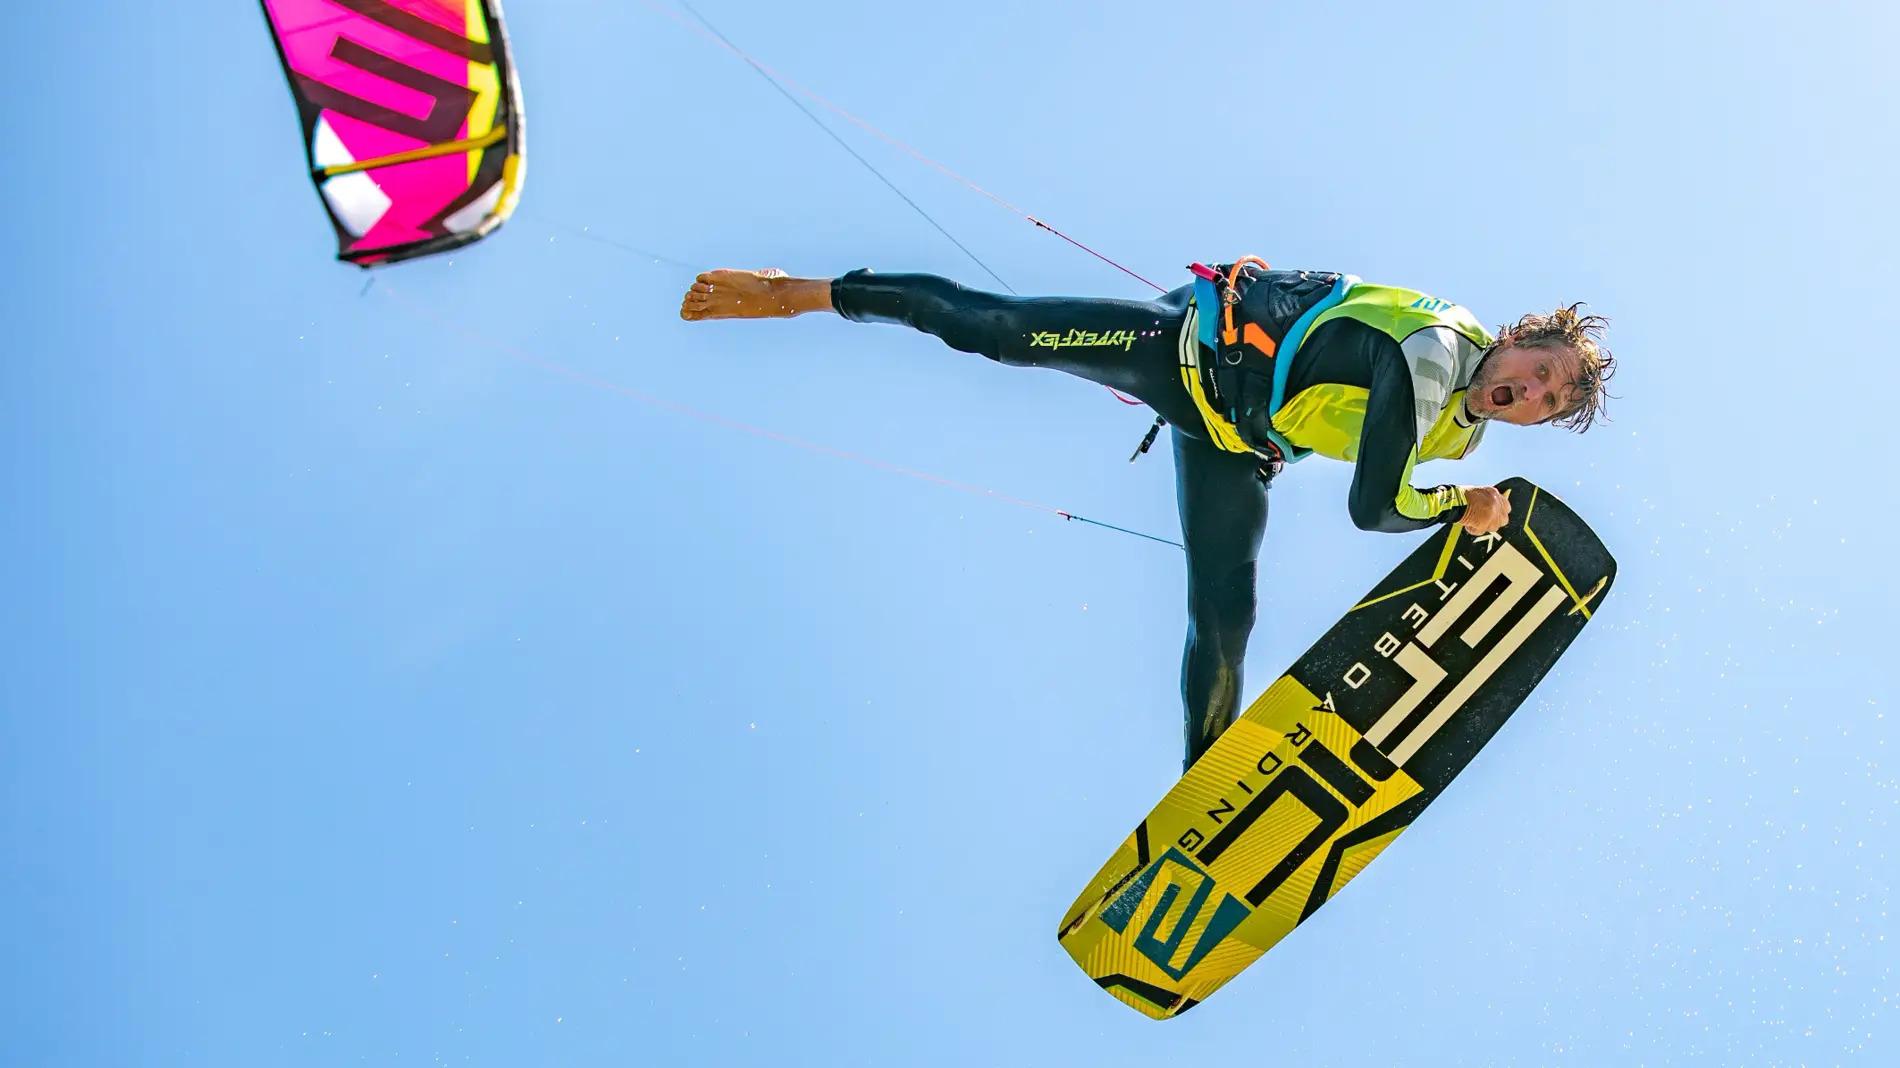 EPIC CRASHES 6 No pain No gain - with Epic Kites Kiteboarding